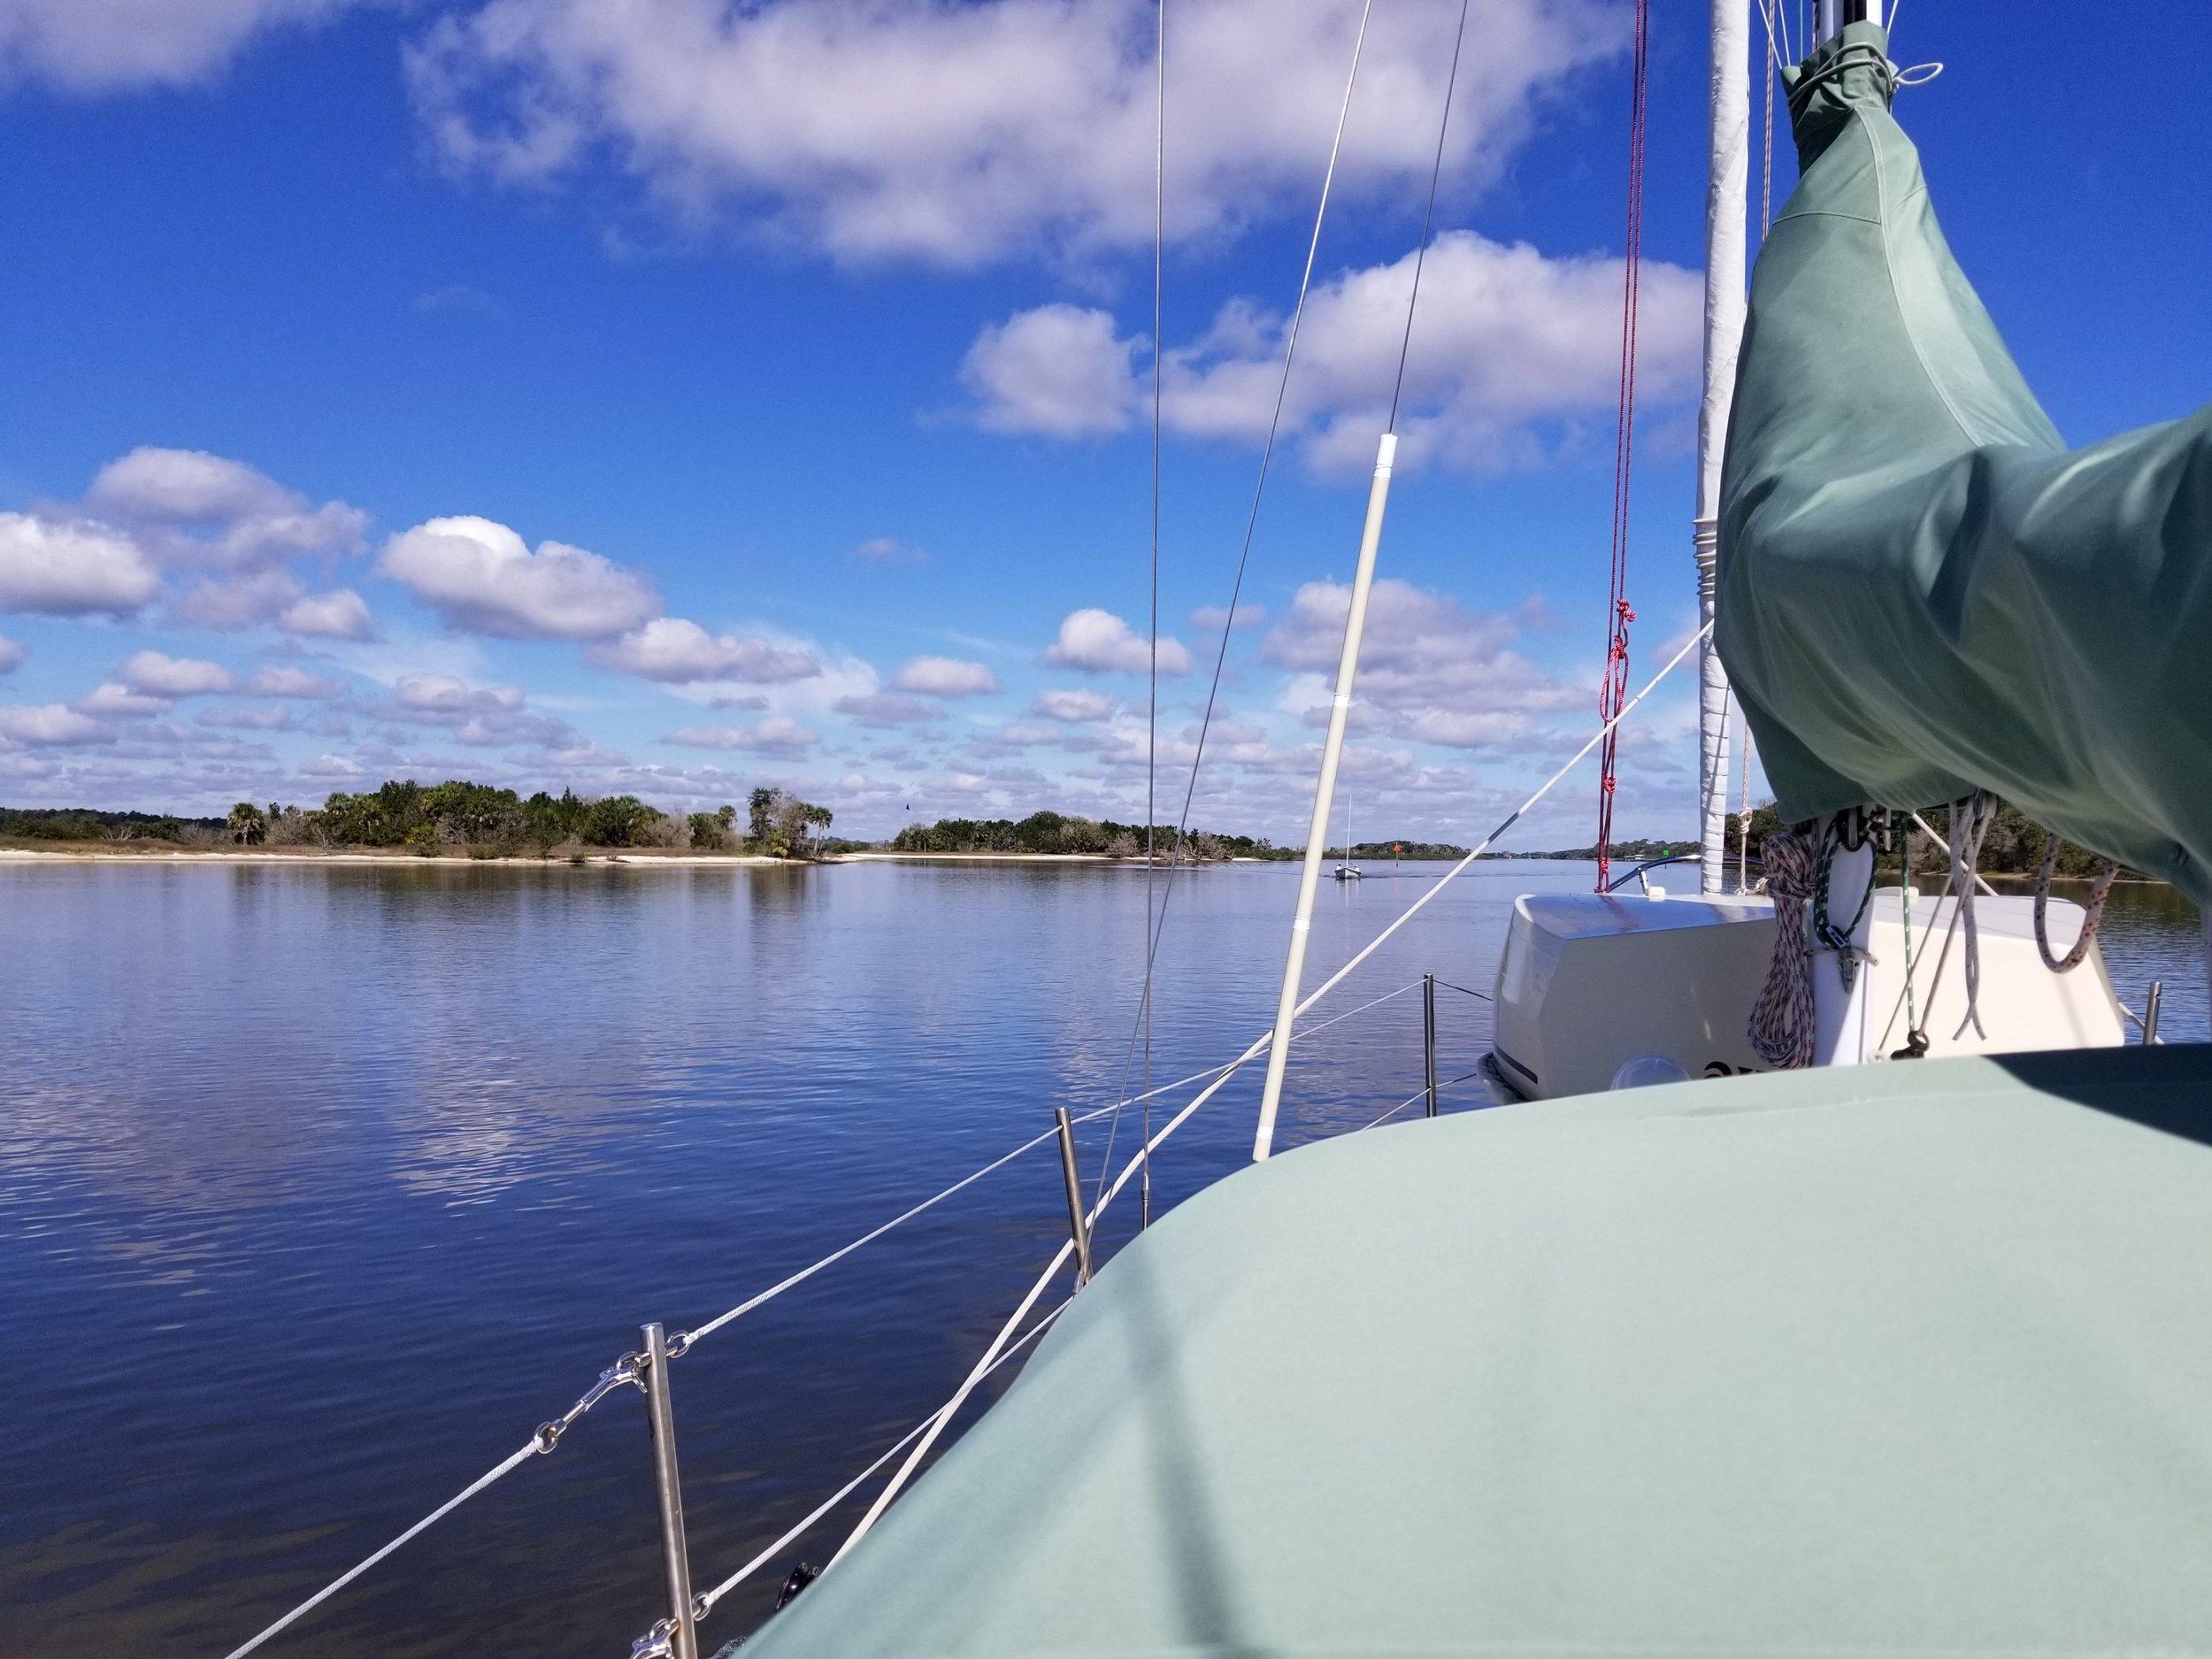 Motoring north on the Tomoka River.